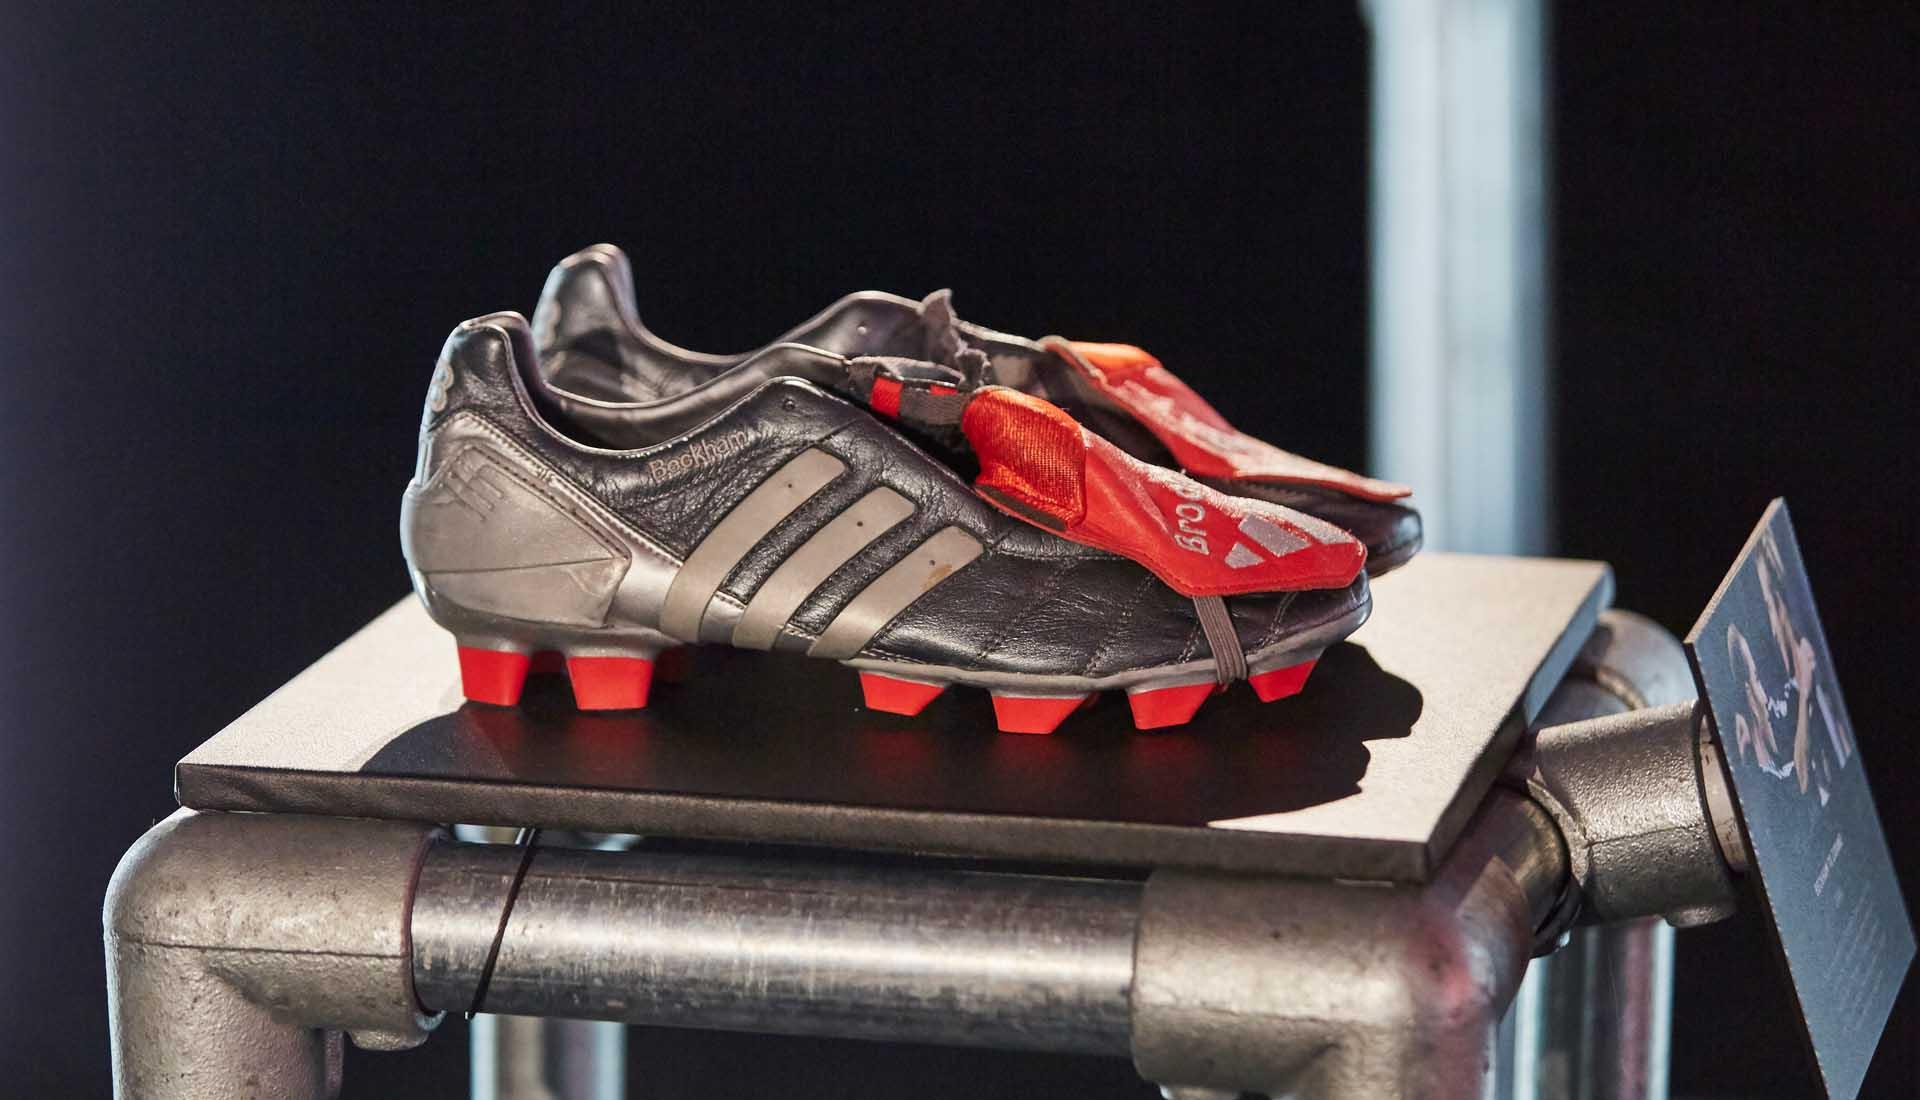 size 40 a16e6 397bd adidas x David Beckham Capsule Collection - We Are Social UK